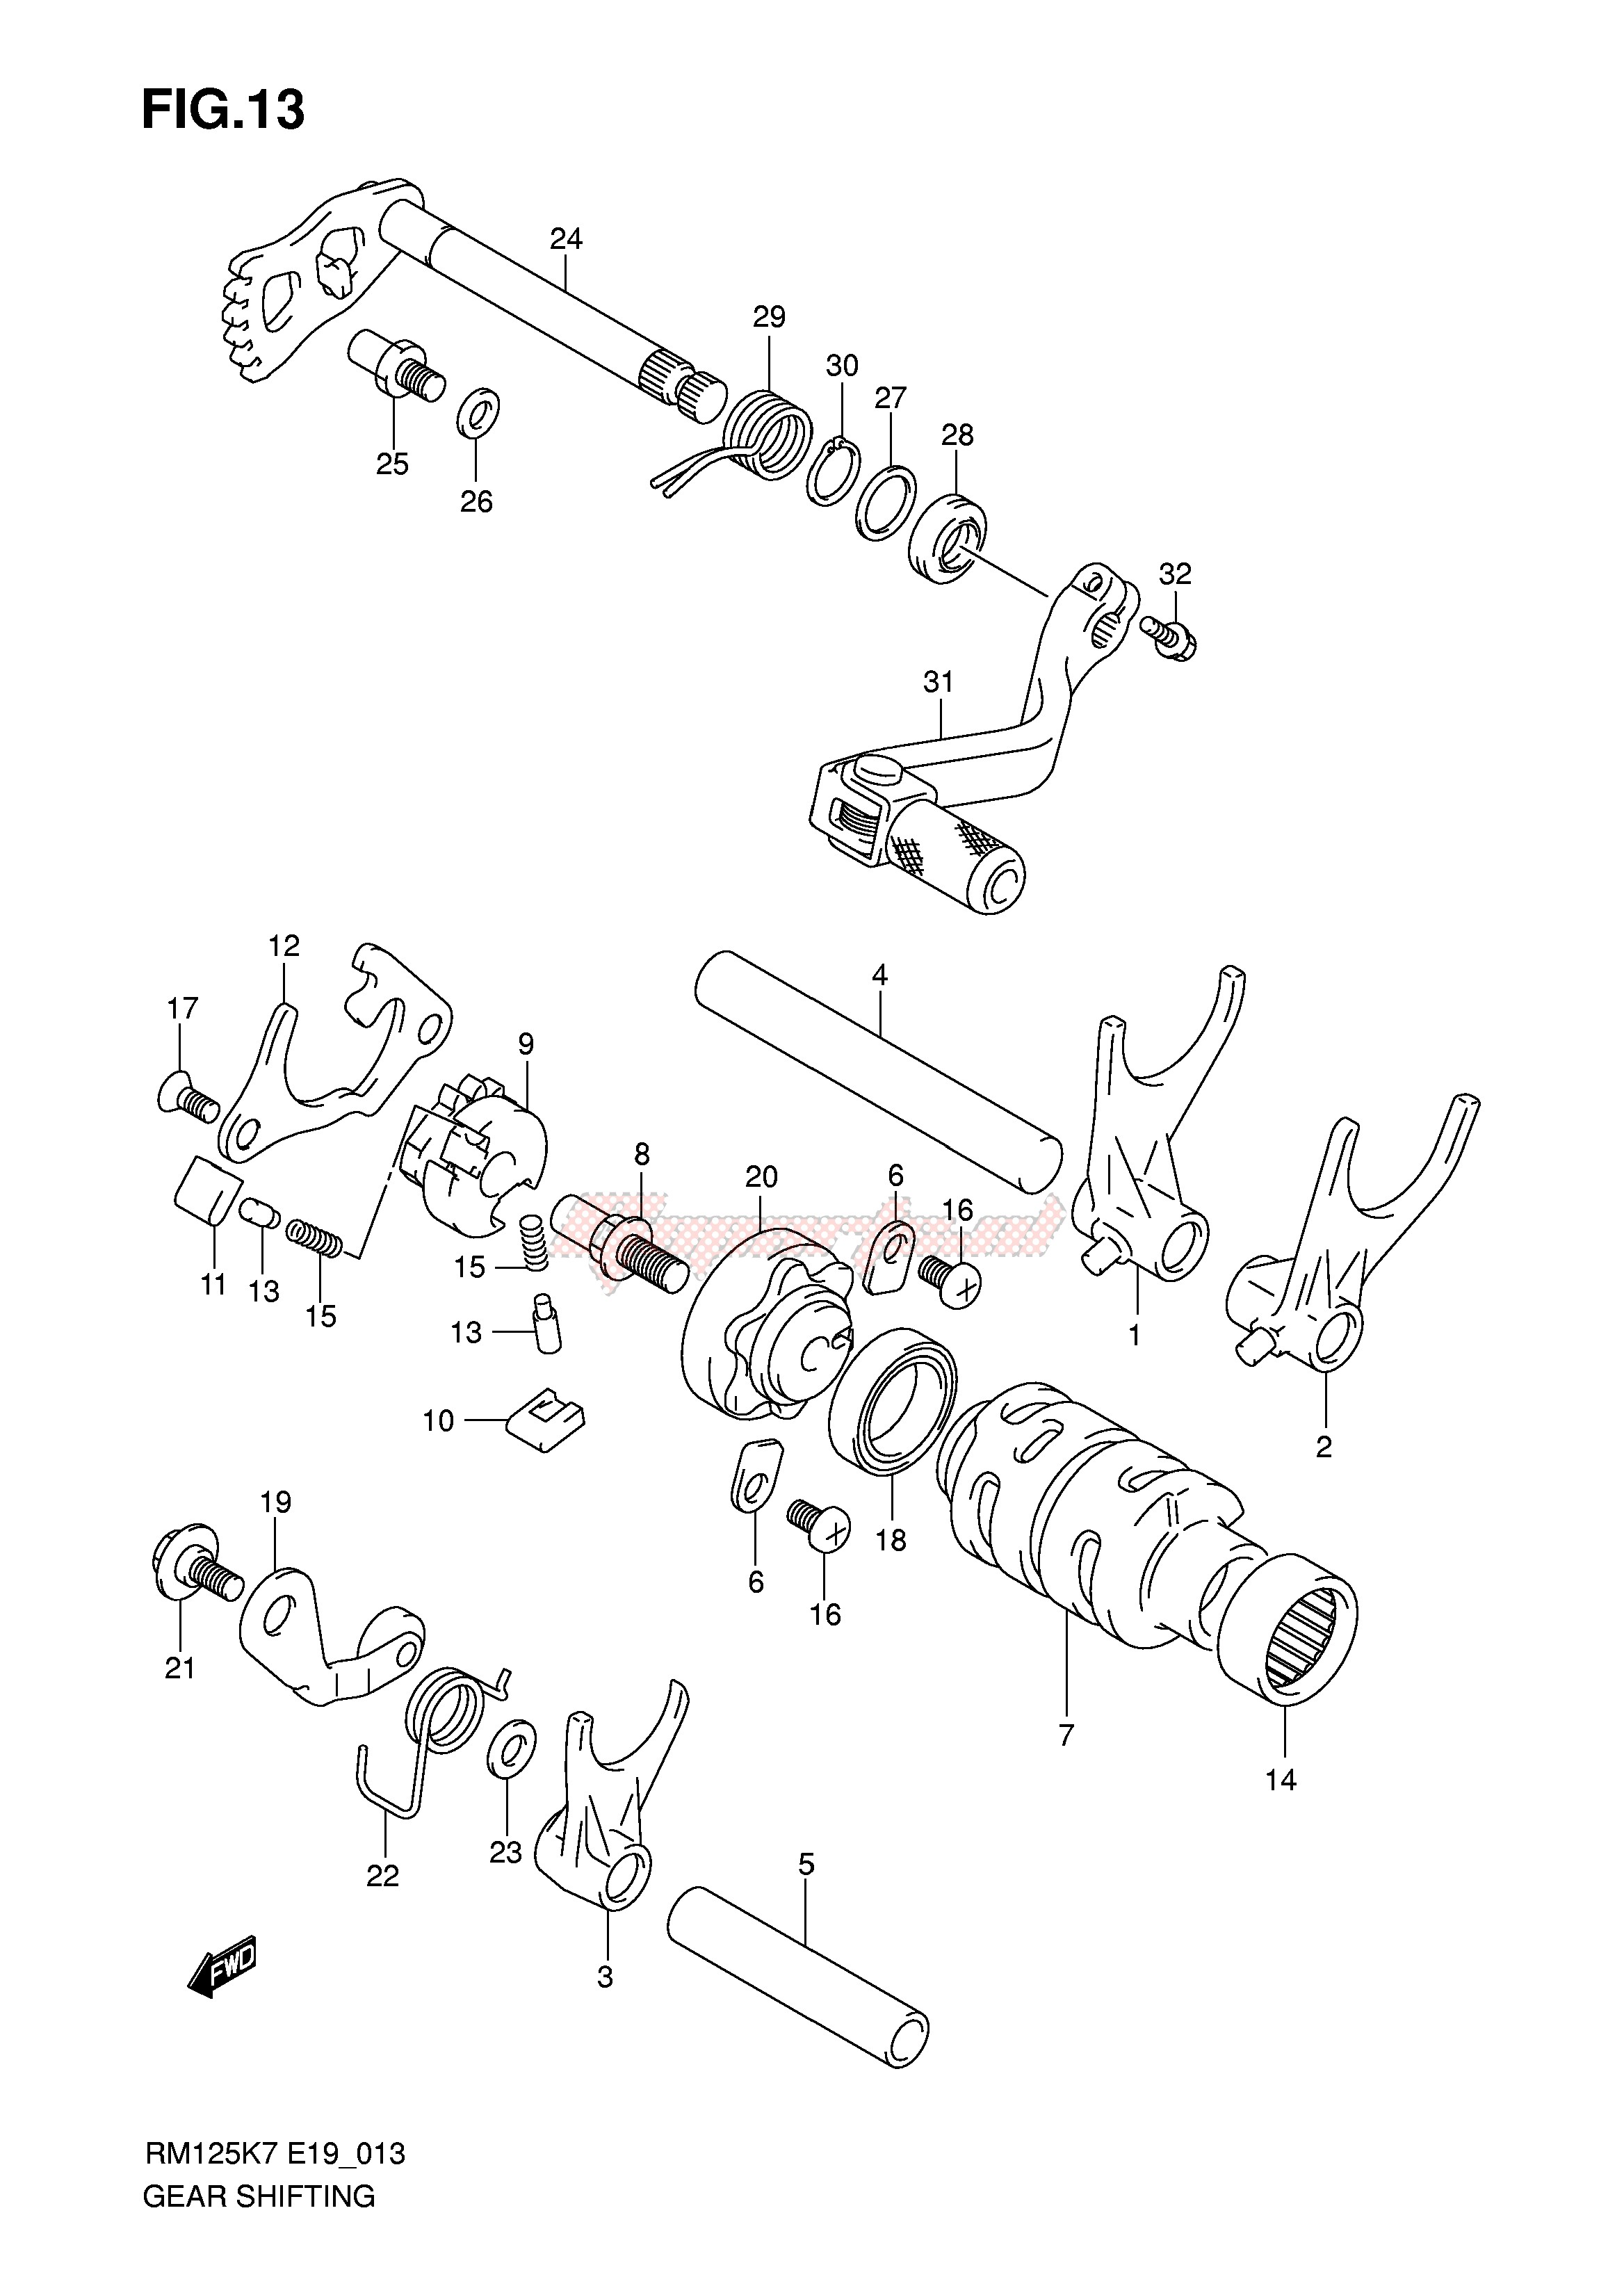 GEAR SHIFTING blueprint